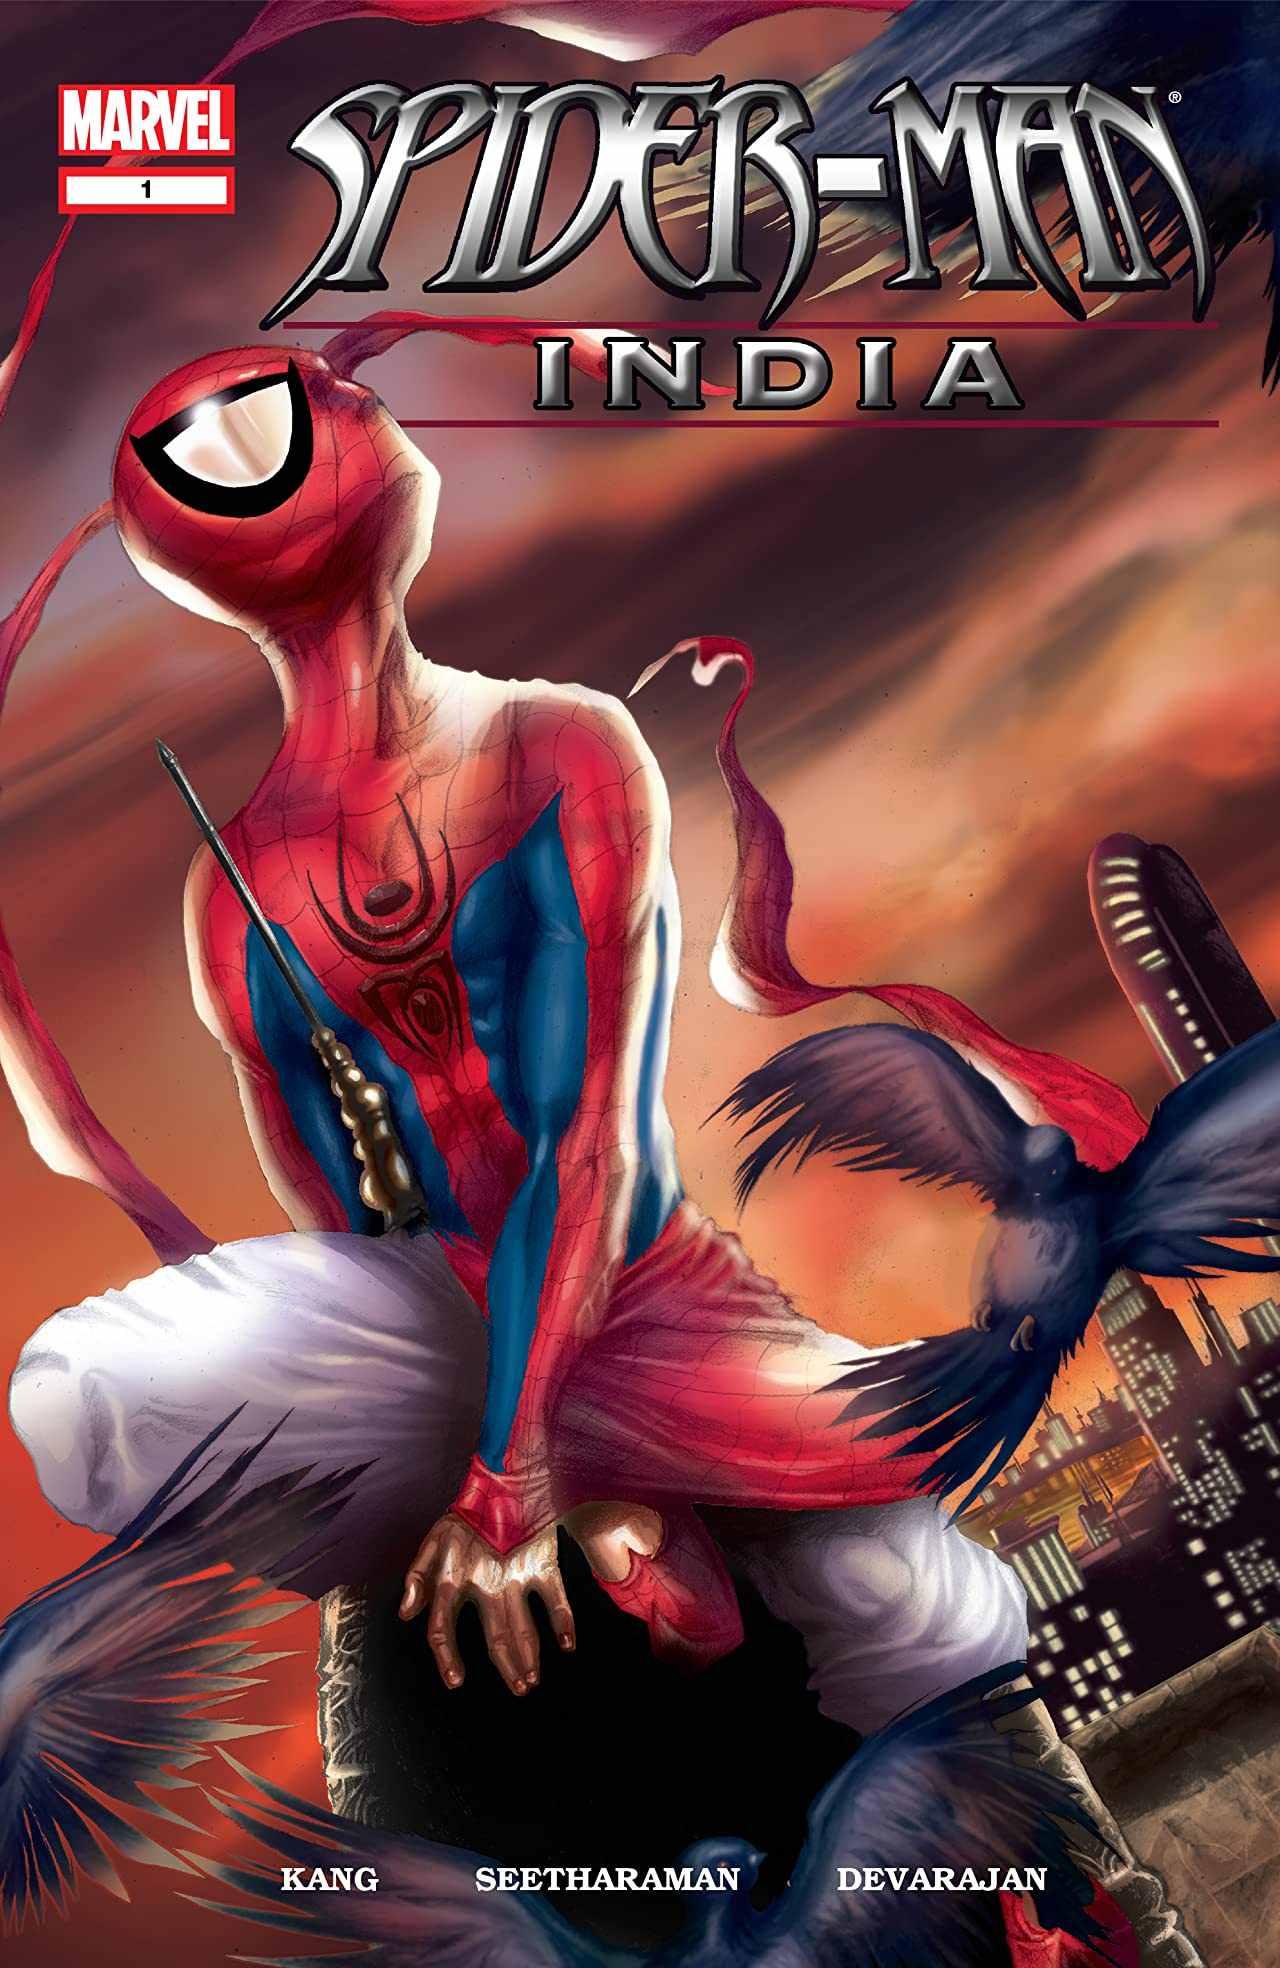 Spider-Man India Comic Multiverso Spider-Man Into the Spdier Verse 2